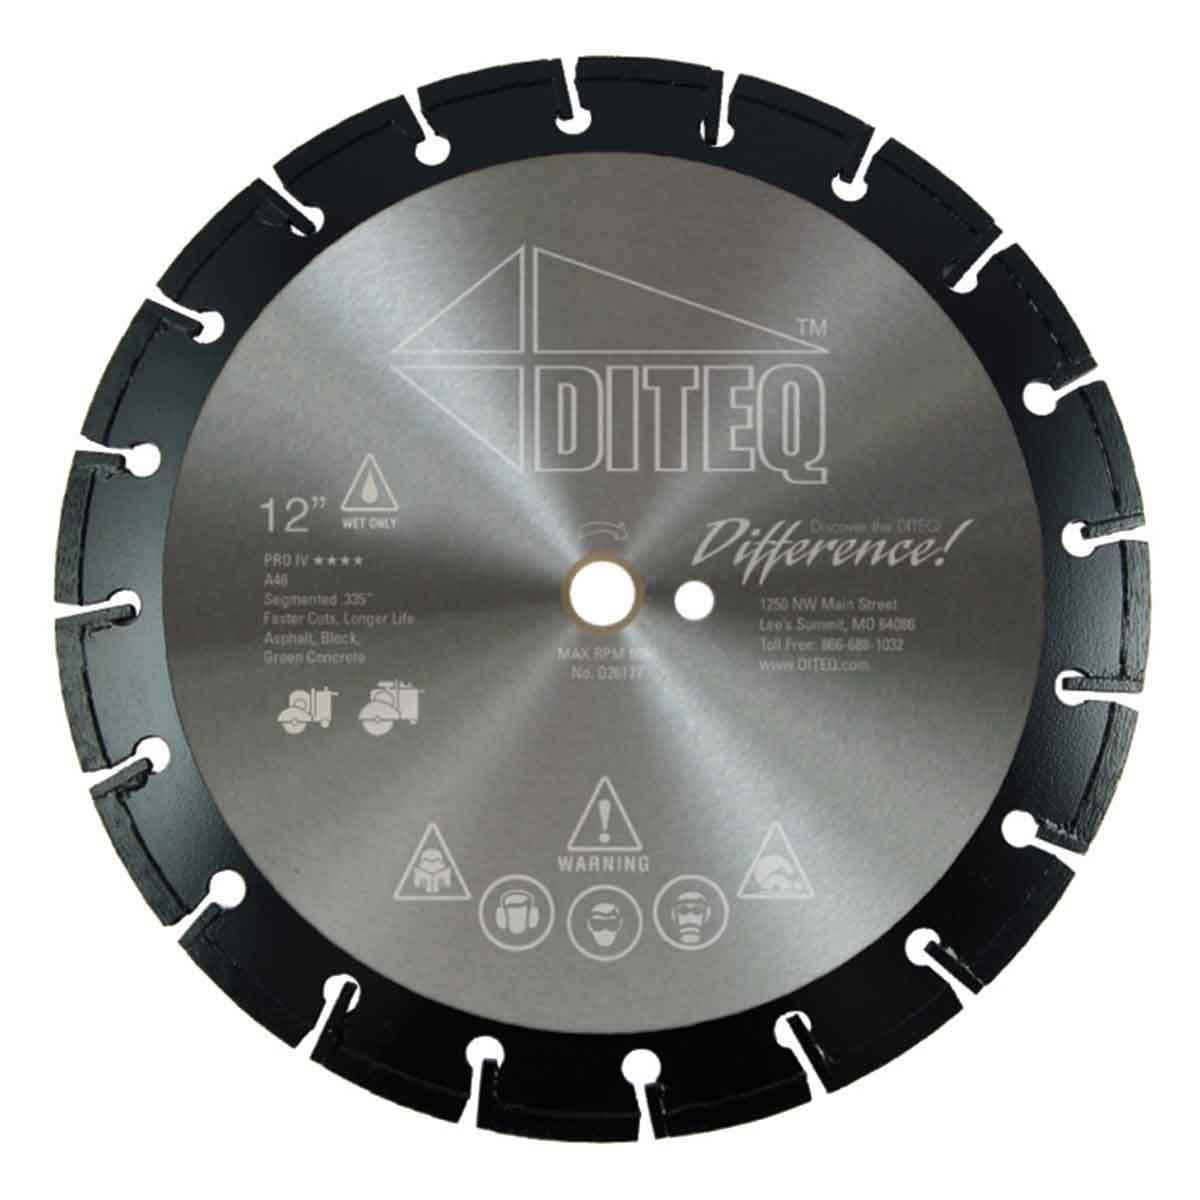 Diteq 14 inch Flat saw PRO IV Green Concrete/Asphalt